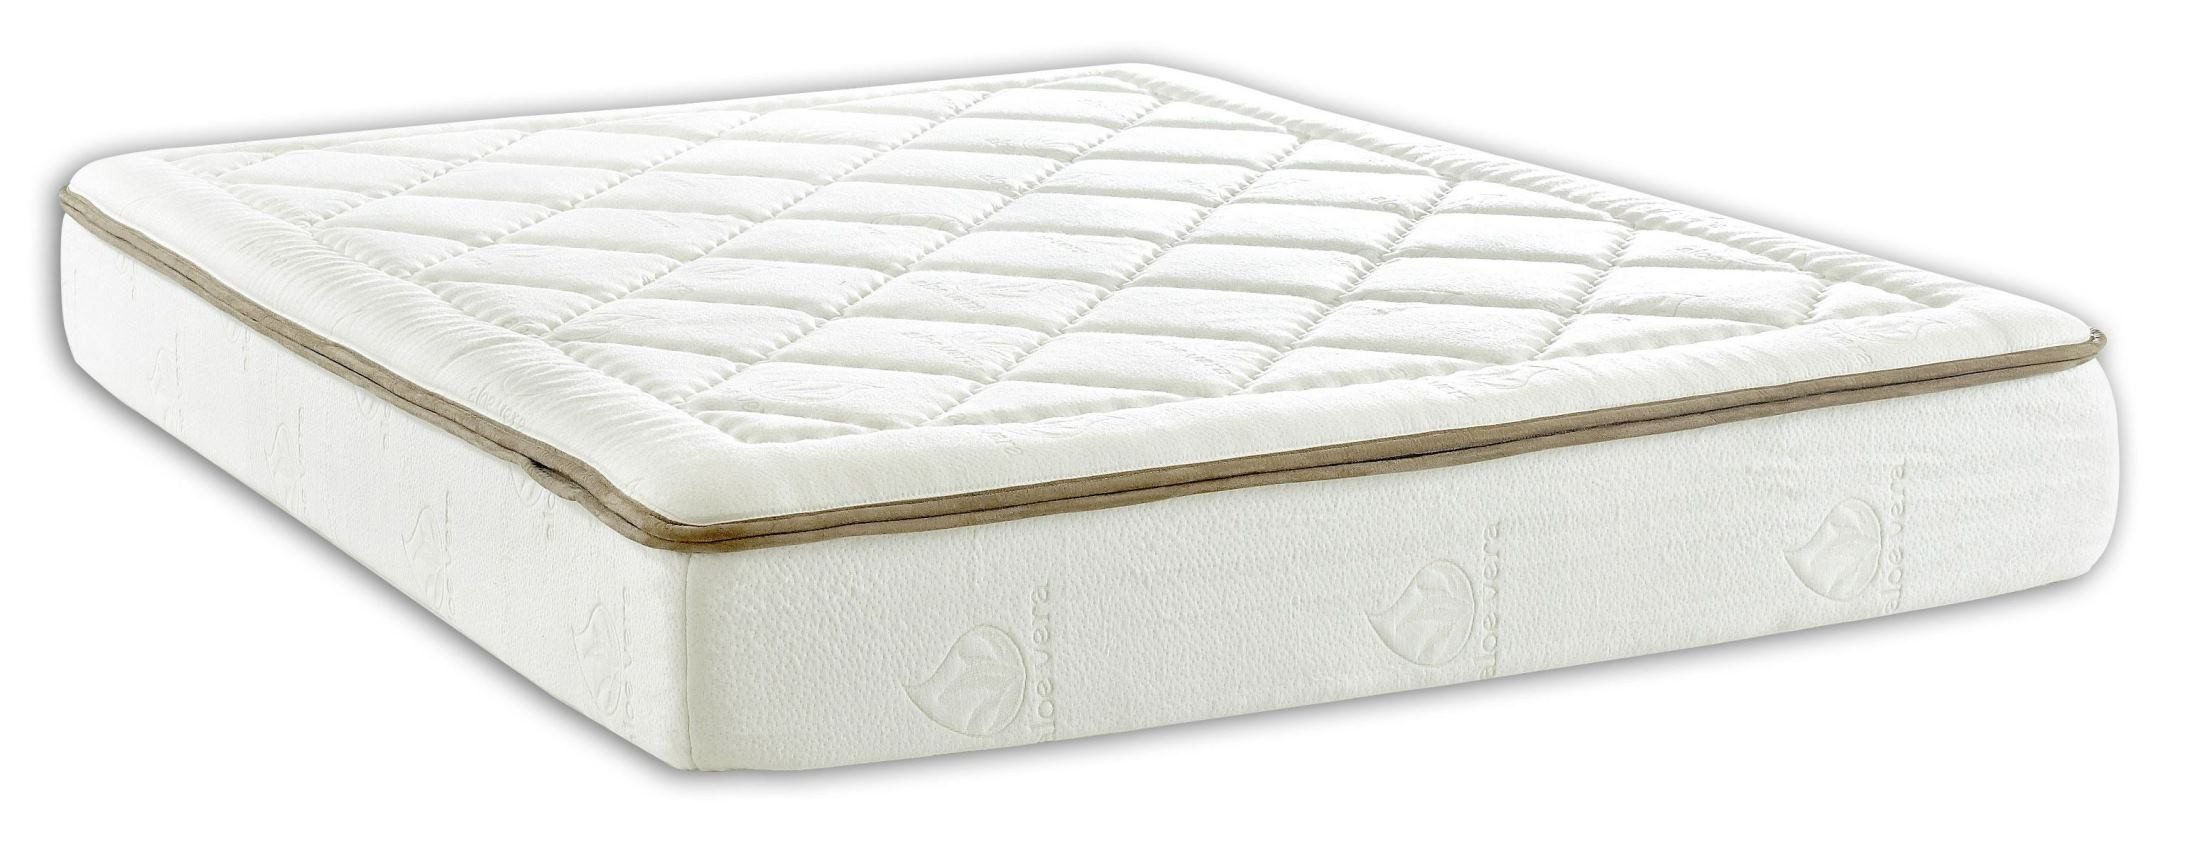 Dream Weaver 10 Memory Foam Full Mattress From Klaussner Drmwvrffmat Coleman Furniture